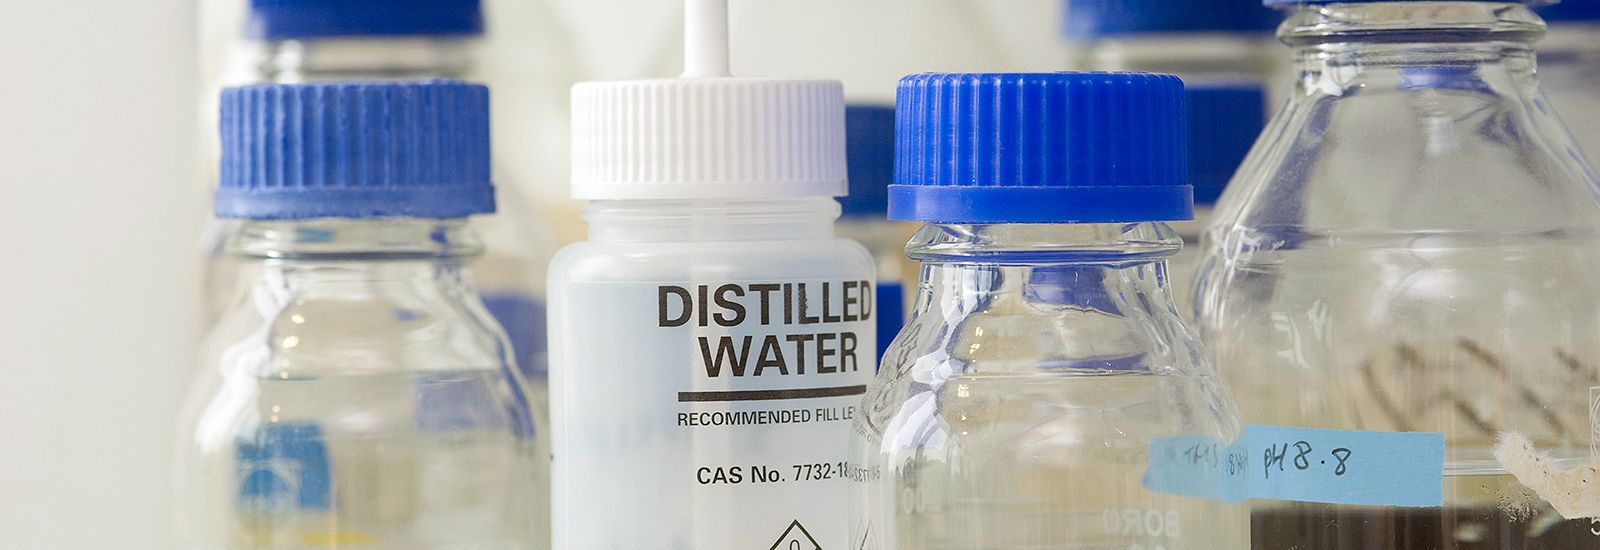 Bottles of distilled water